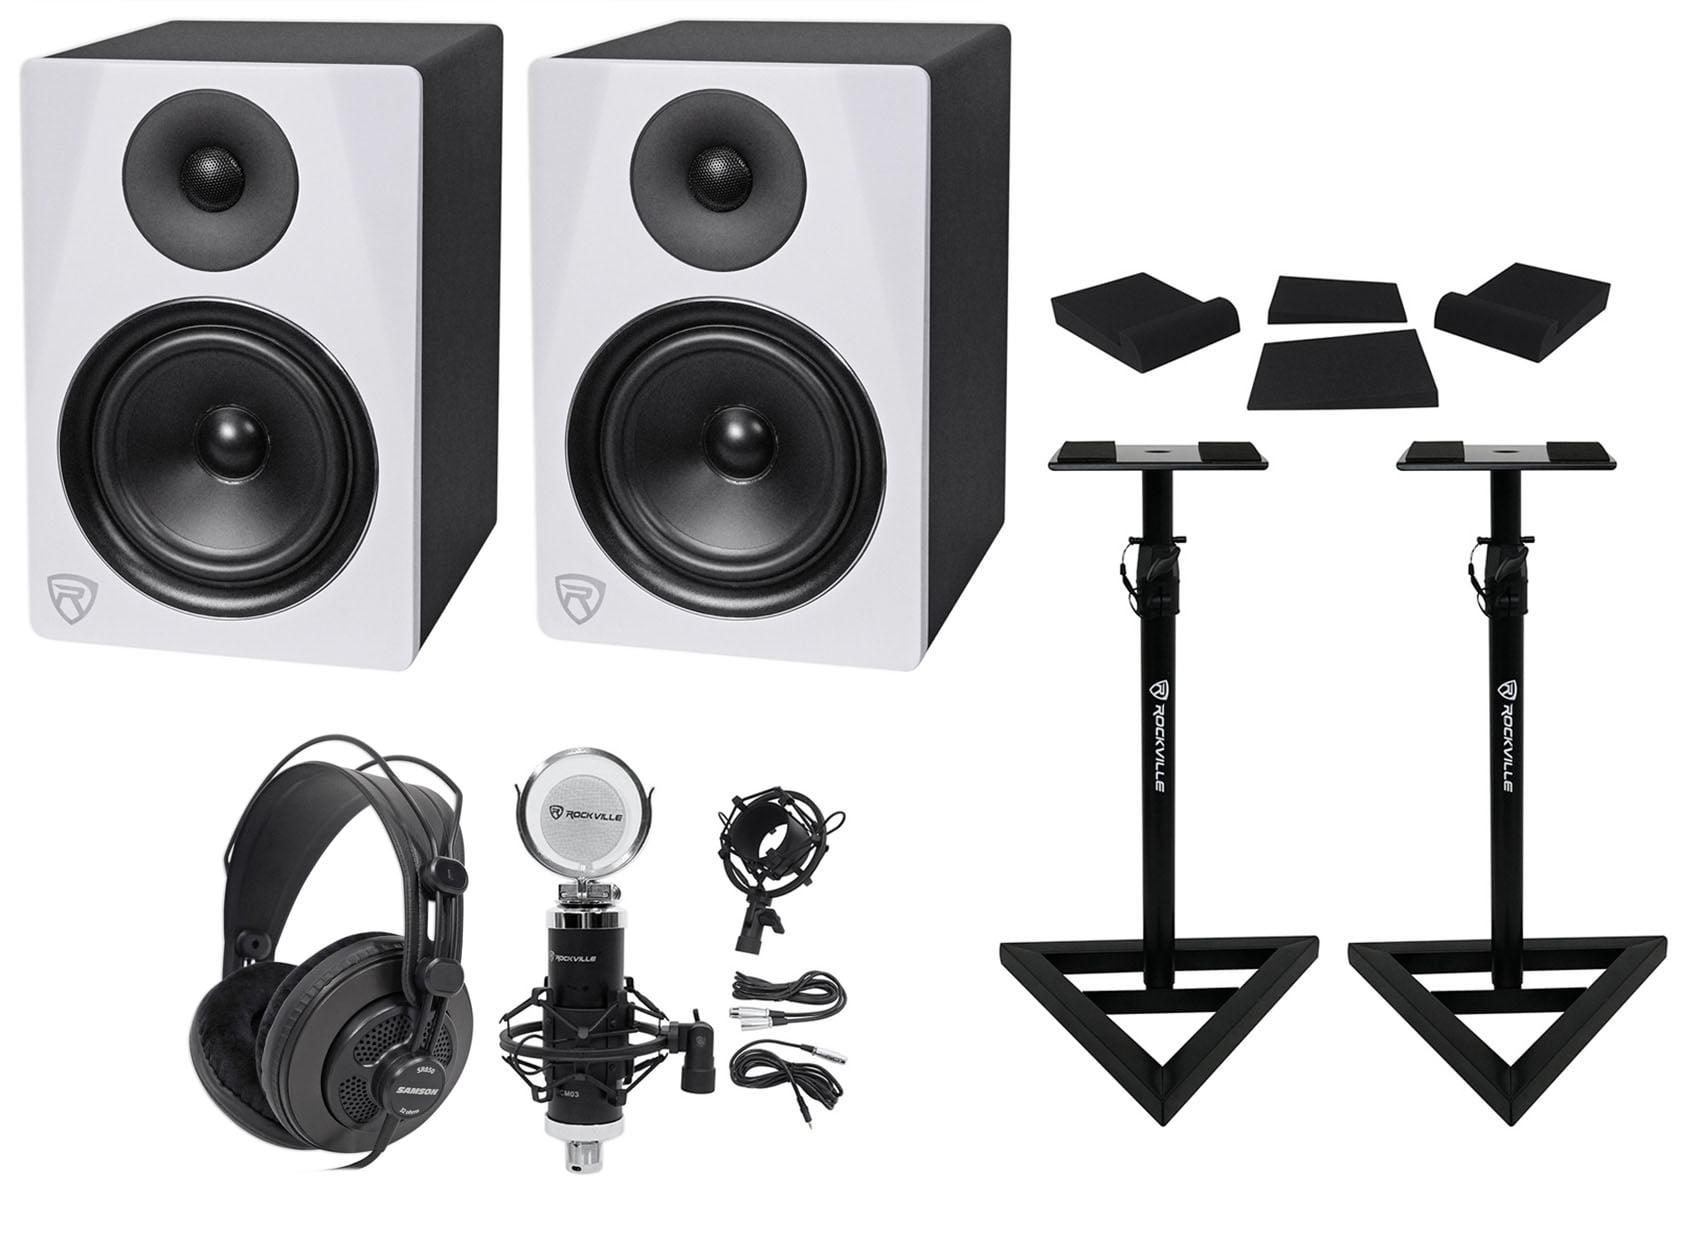 "(2) Rockville DPM6W 6.5"" 420w Dual Active Studio Monitors+Stands+Headphones+Mic by ROCKVILLE"